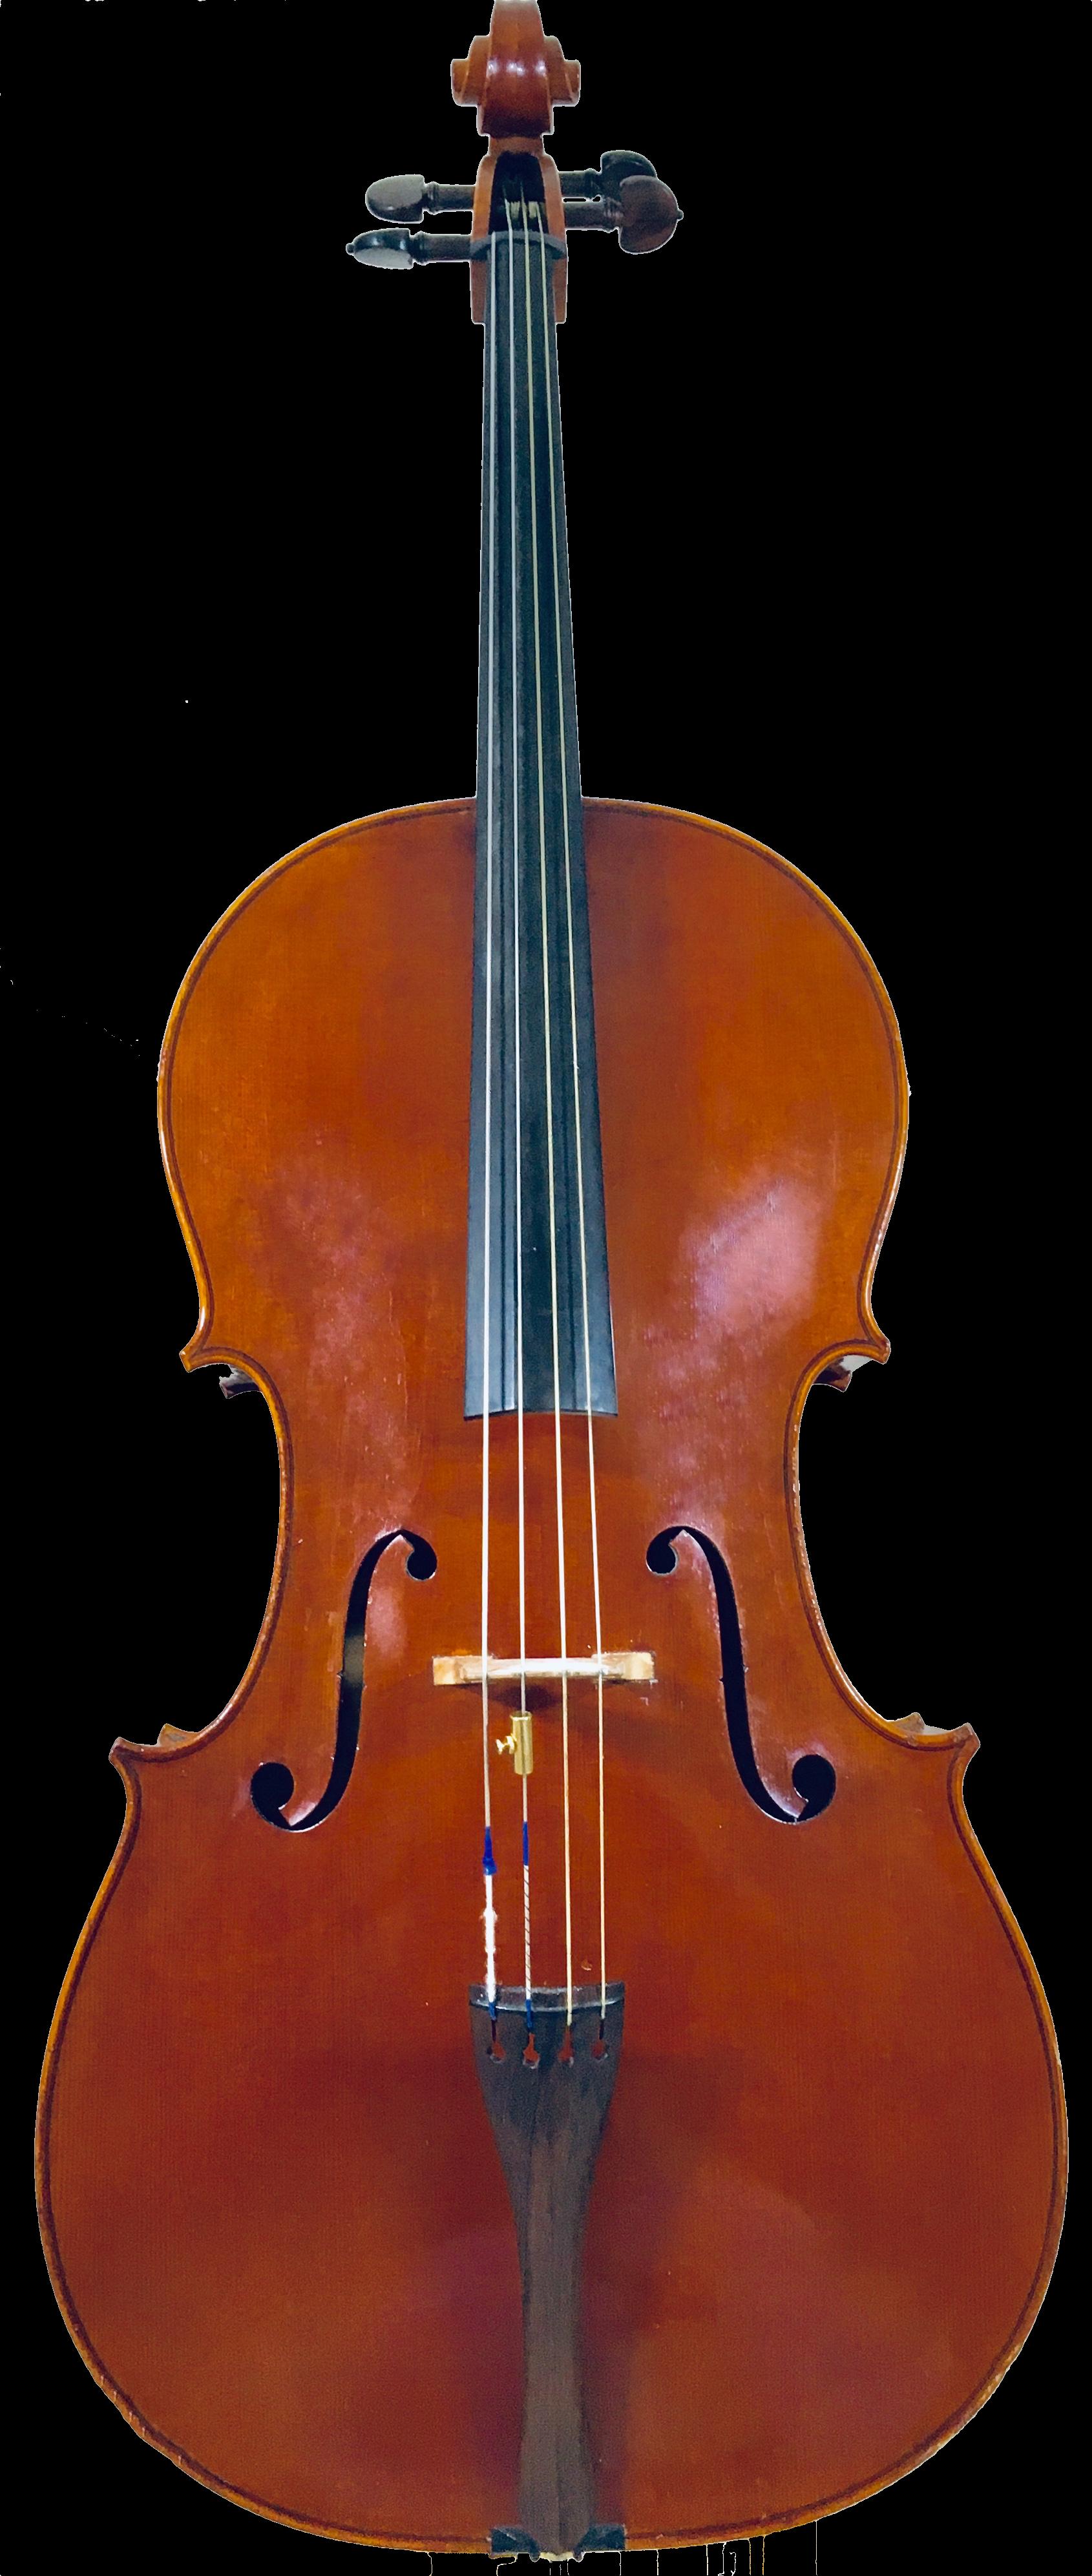 The Tanja Brandon violoncello.